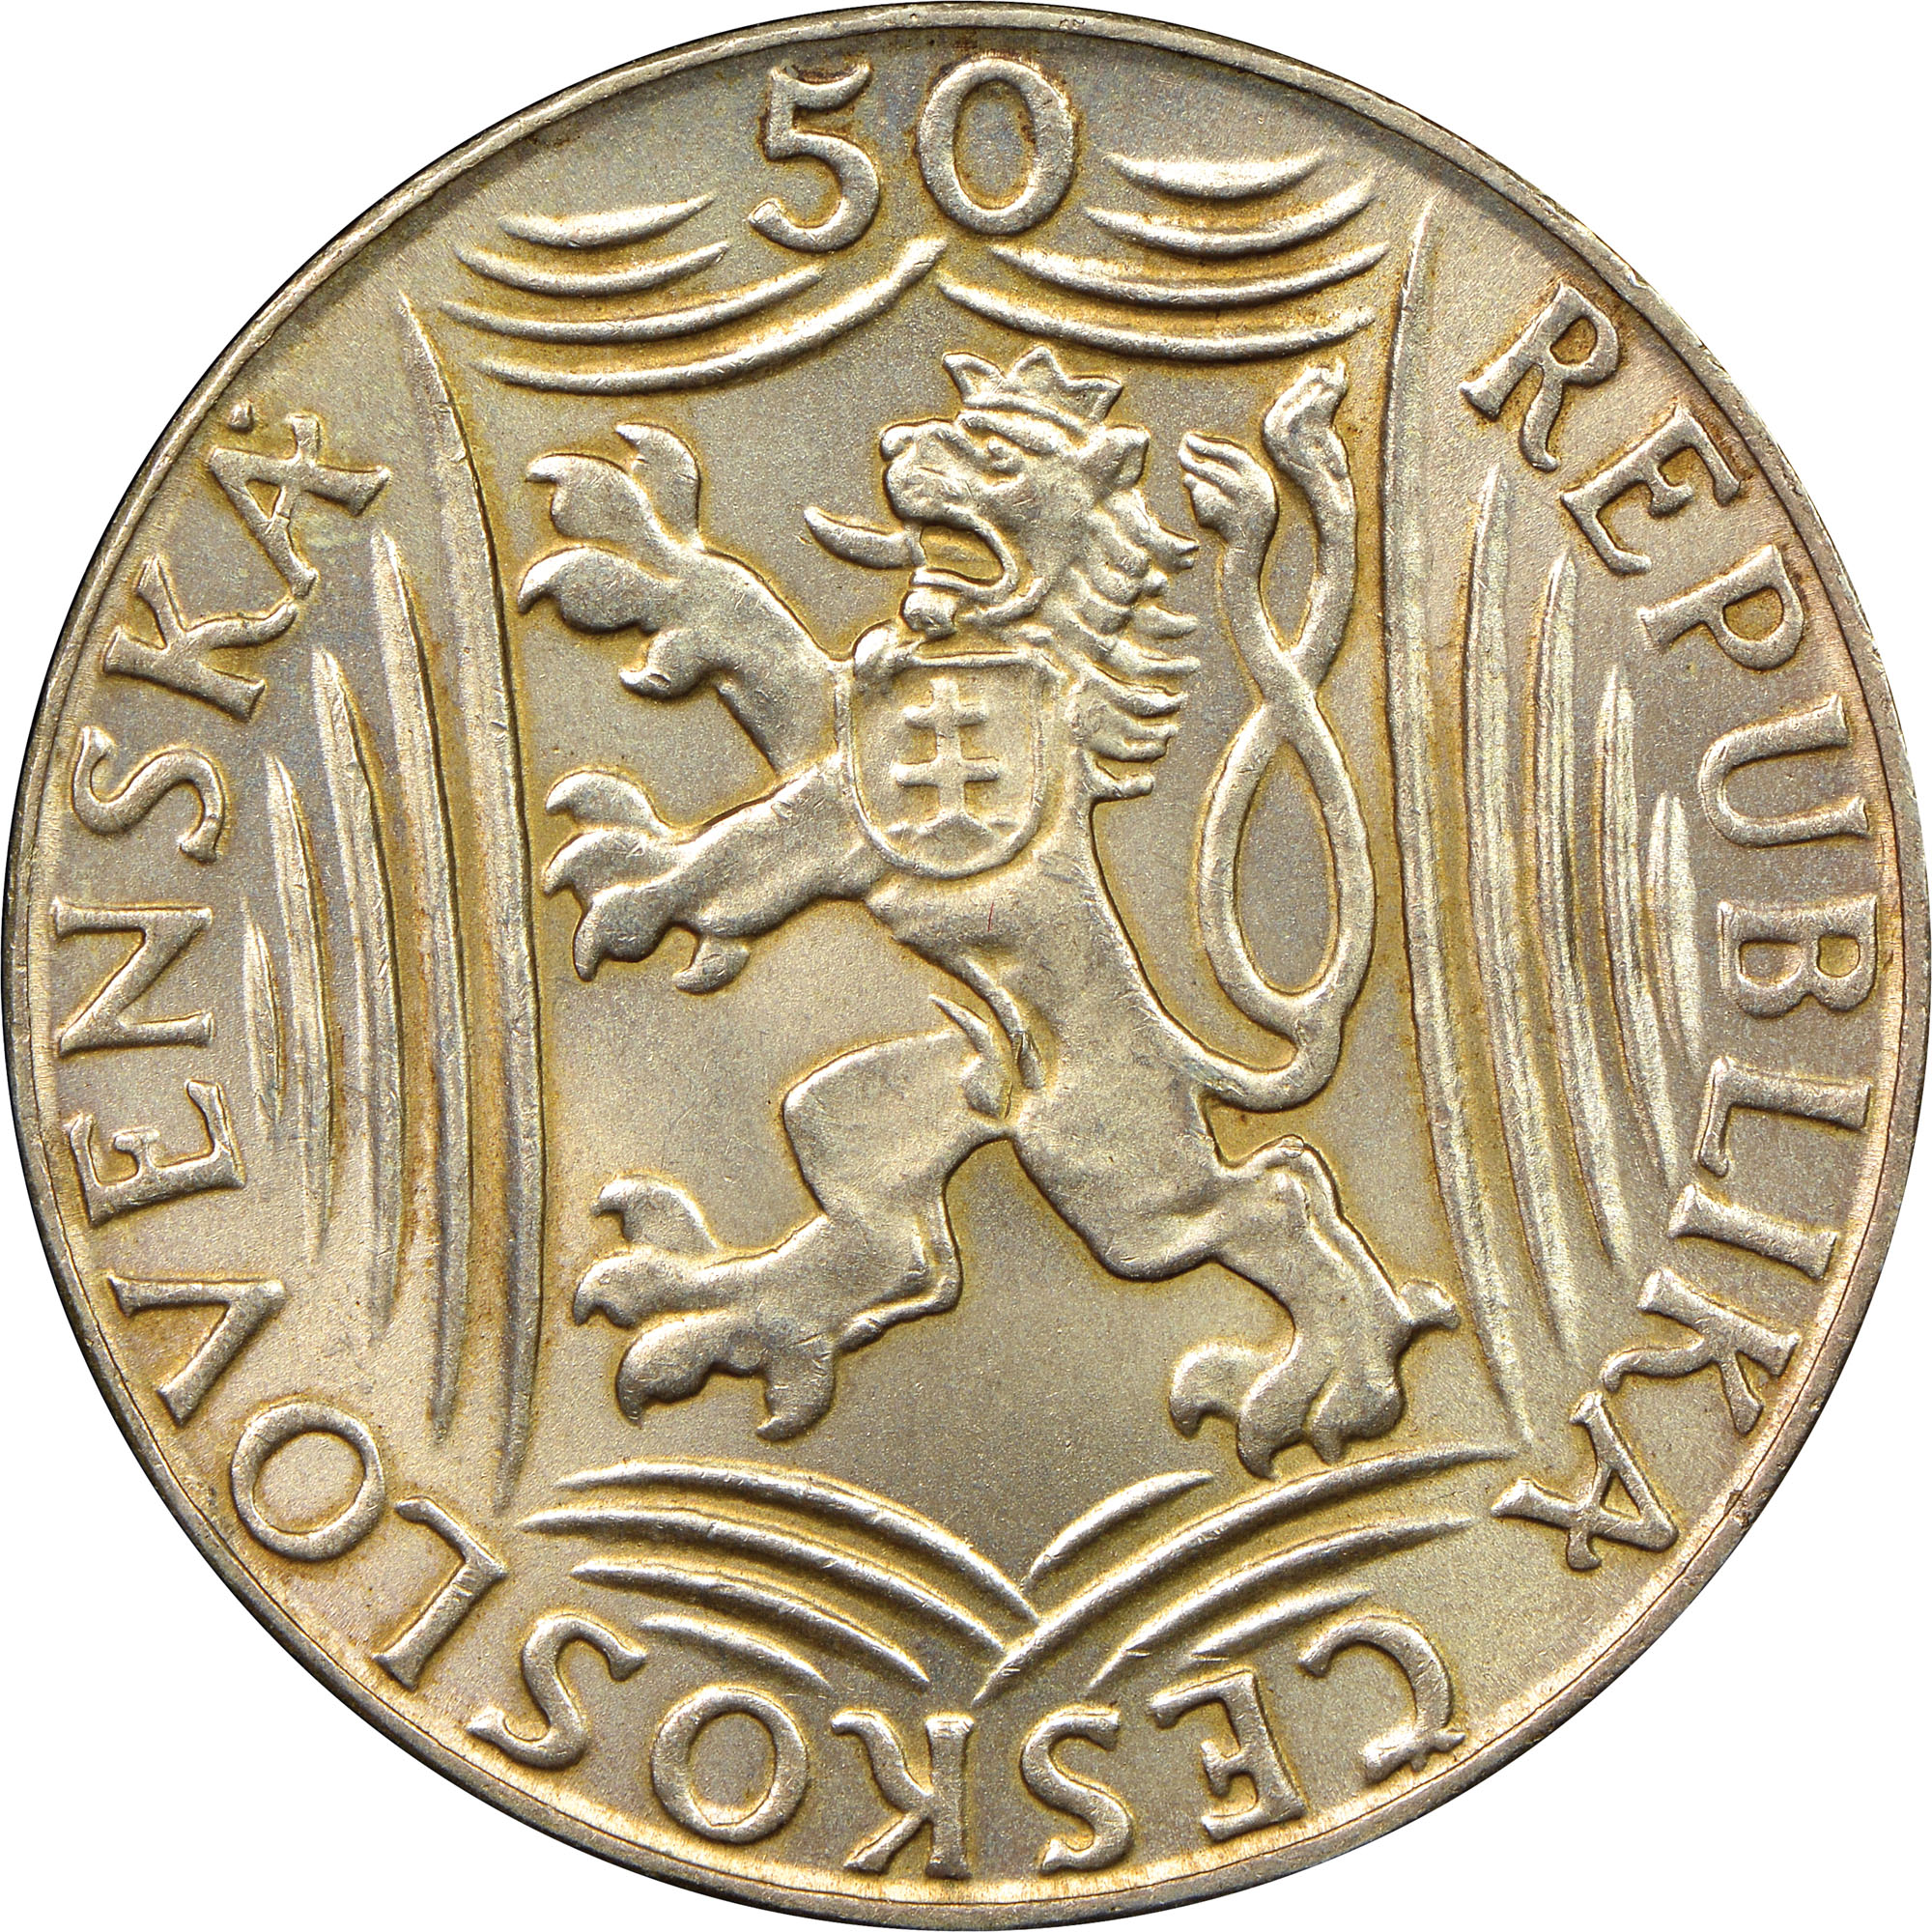 (1949) Czechoslovakia 50 Korun obverse